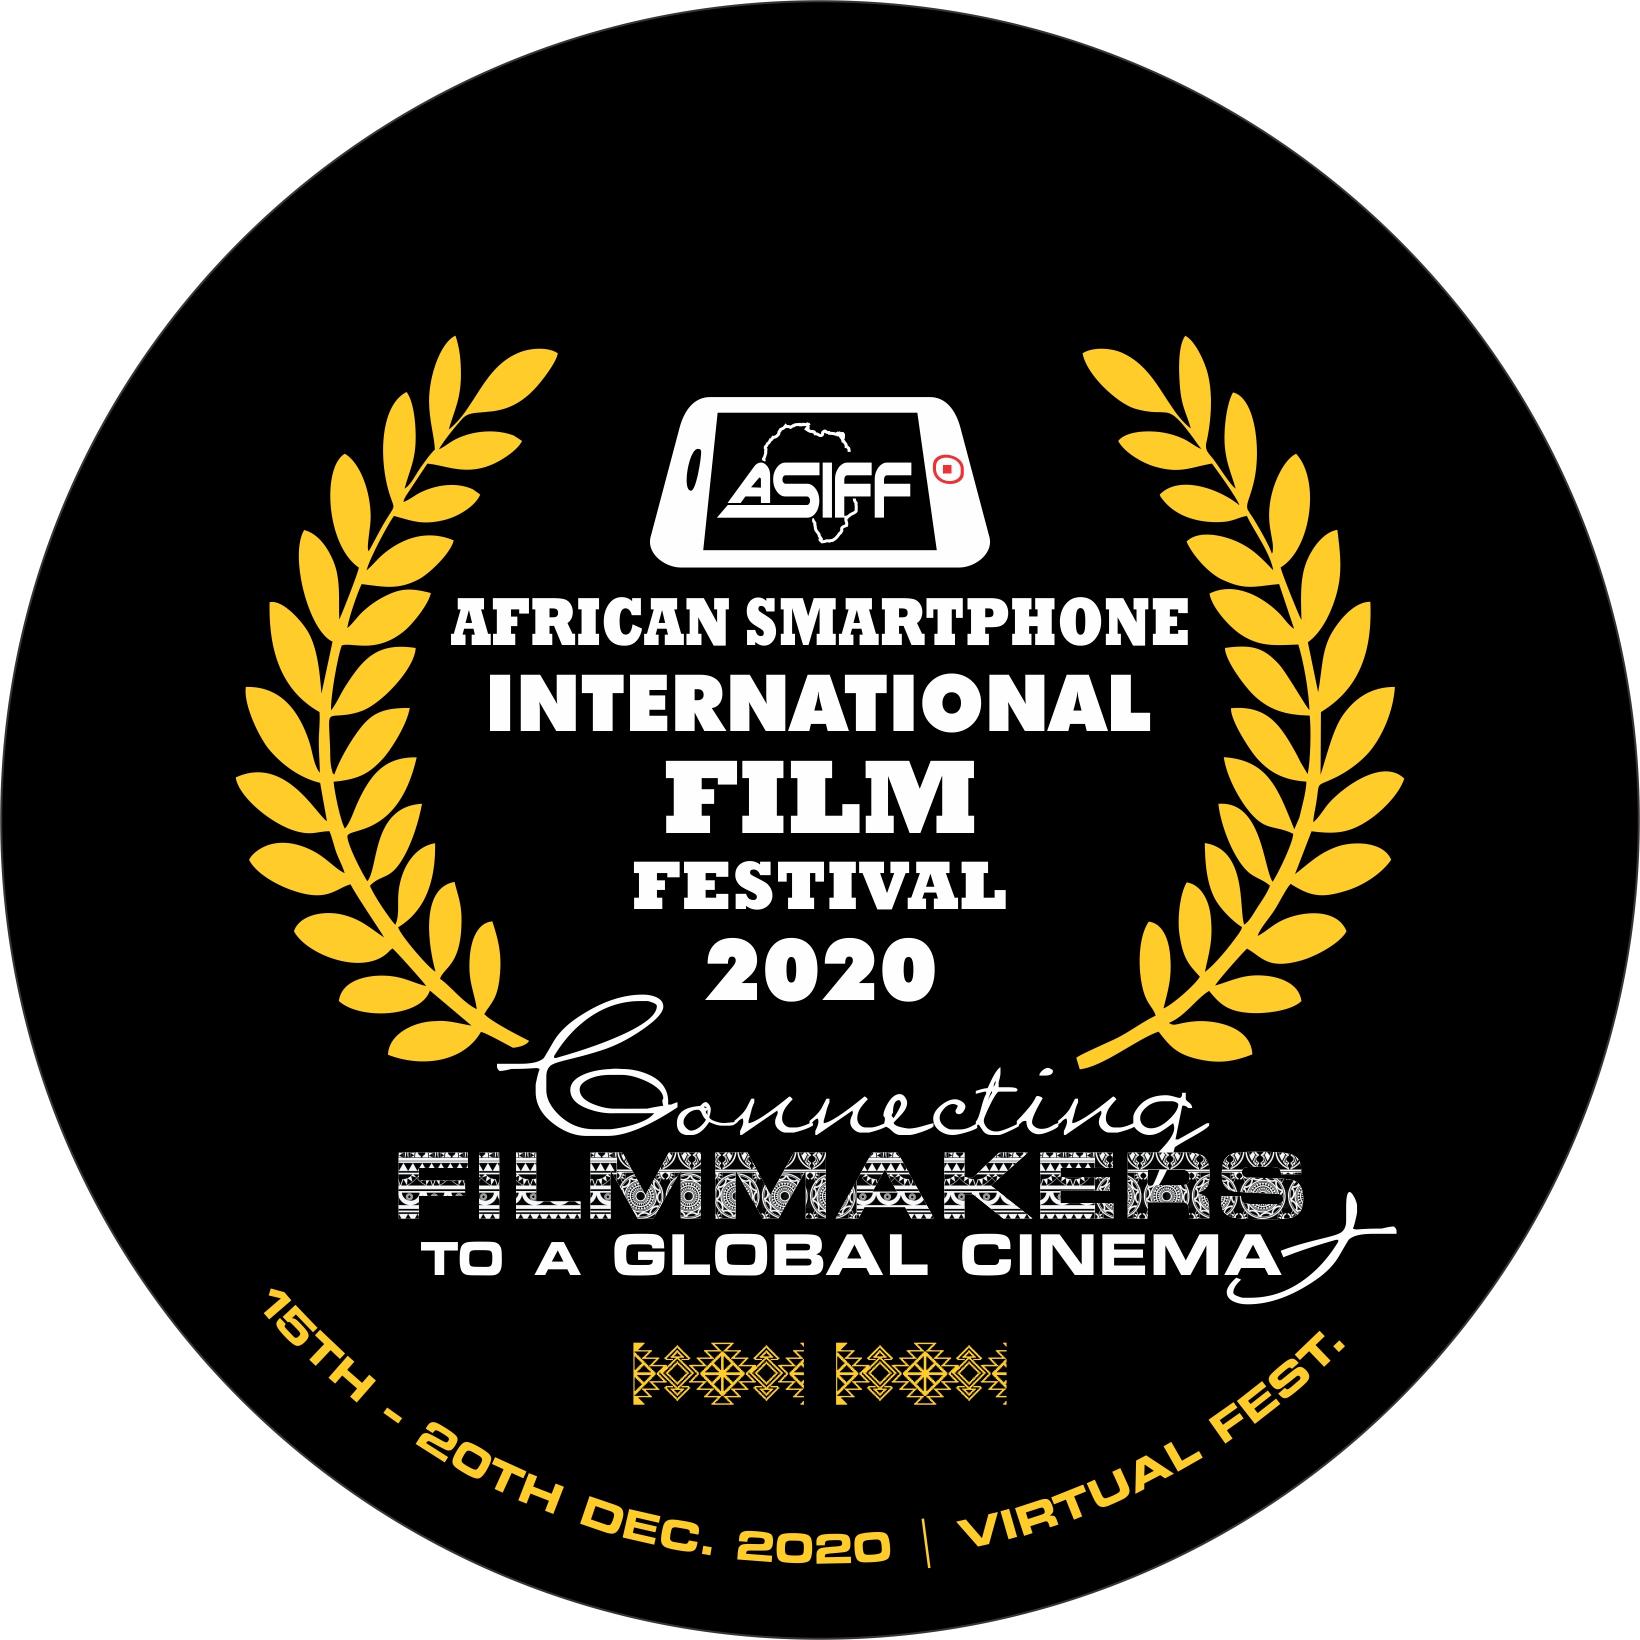 FESTIVAL PROGRAMME- African Smartphone International Film Festival (ASIFF2020)